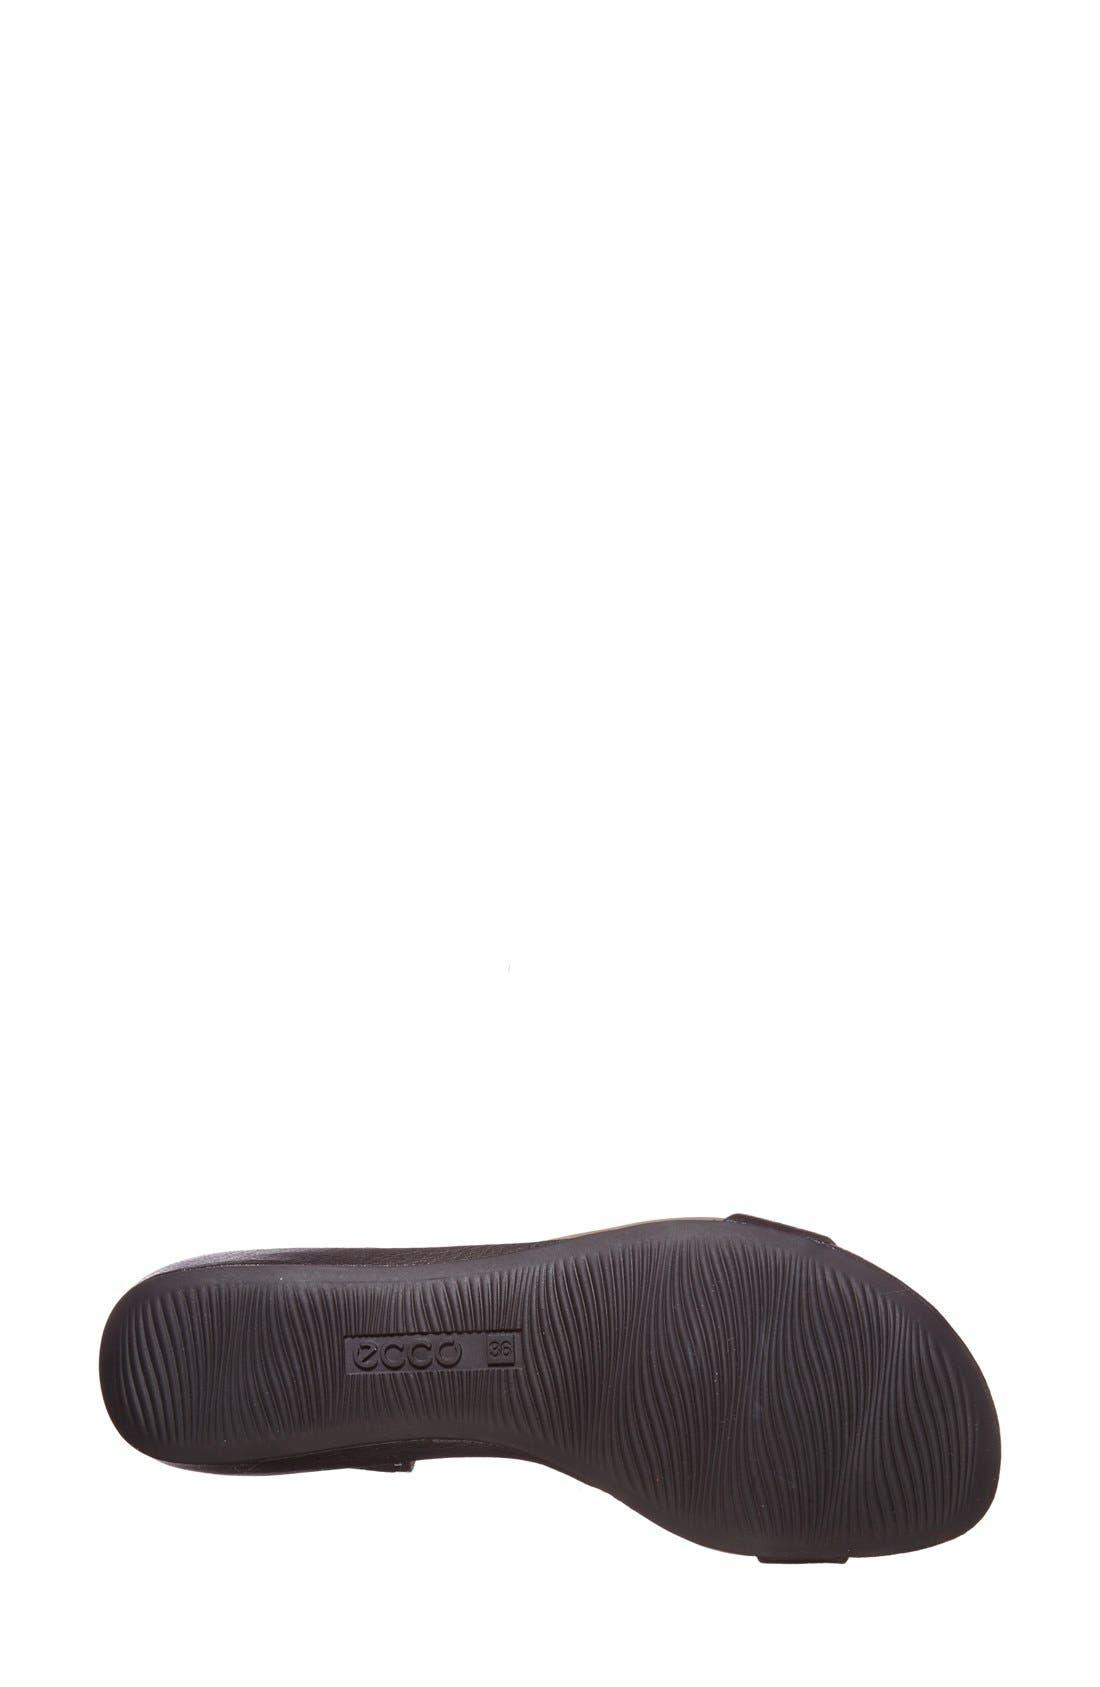 ECCO,                             'Bouillon' Leather Sandal,                             Alternate thumbnail 4, color,                             001